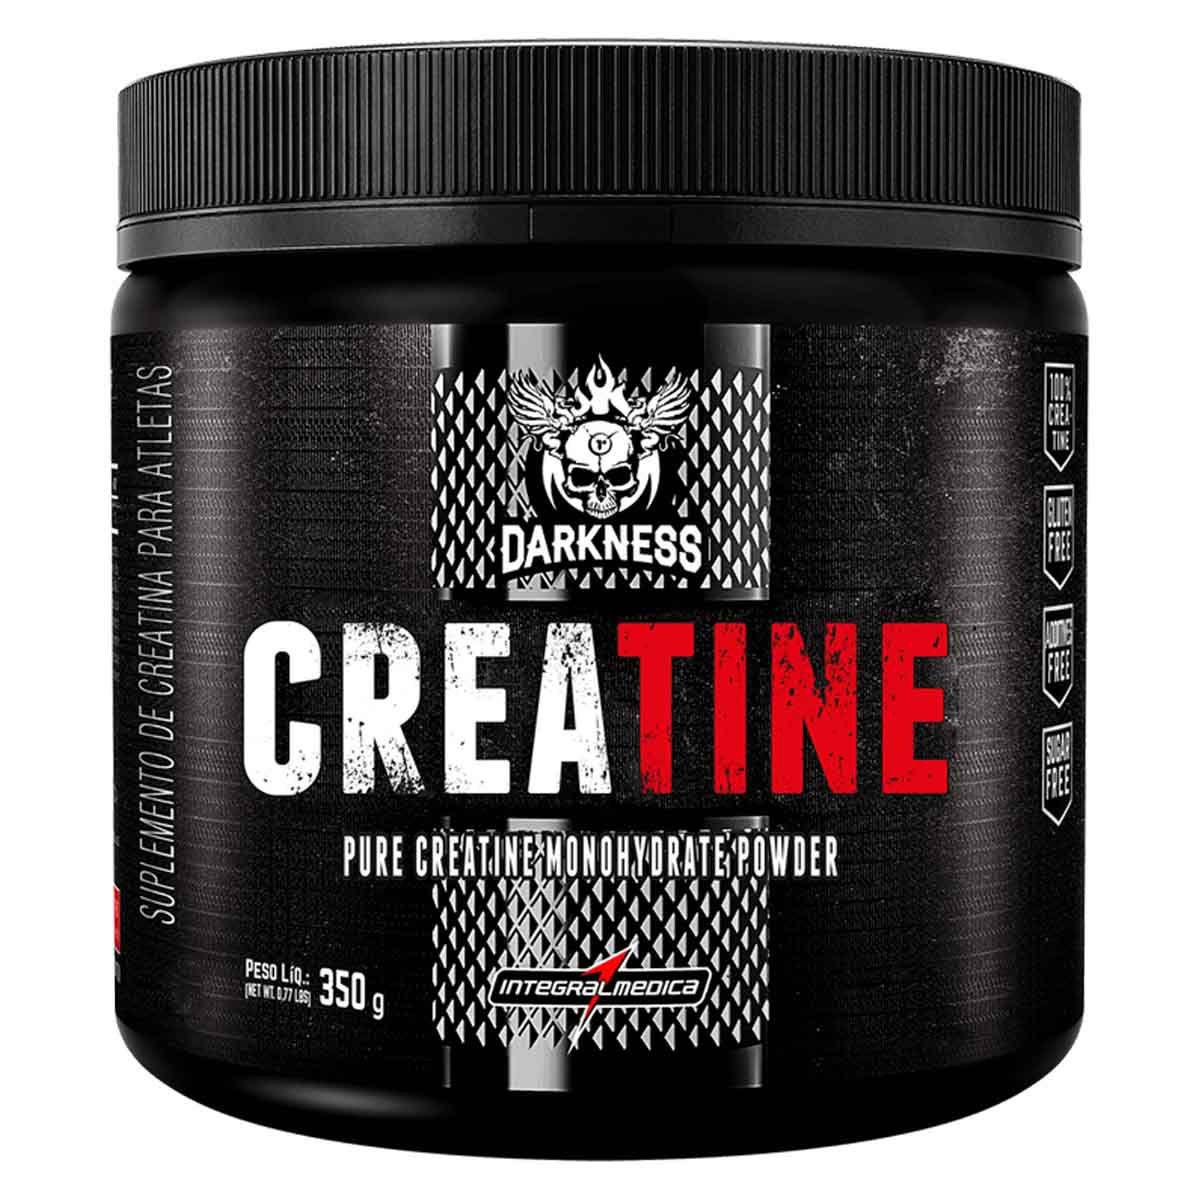 Creatine Creapure Darkness 350g - Integral Médica